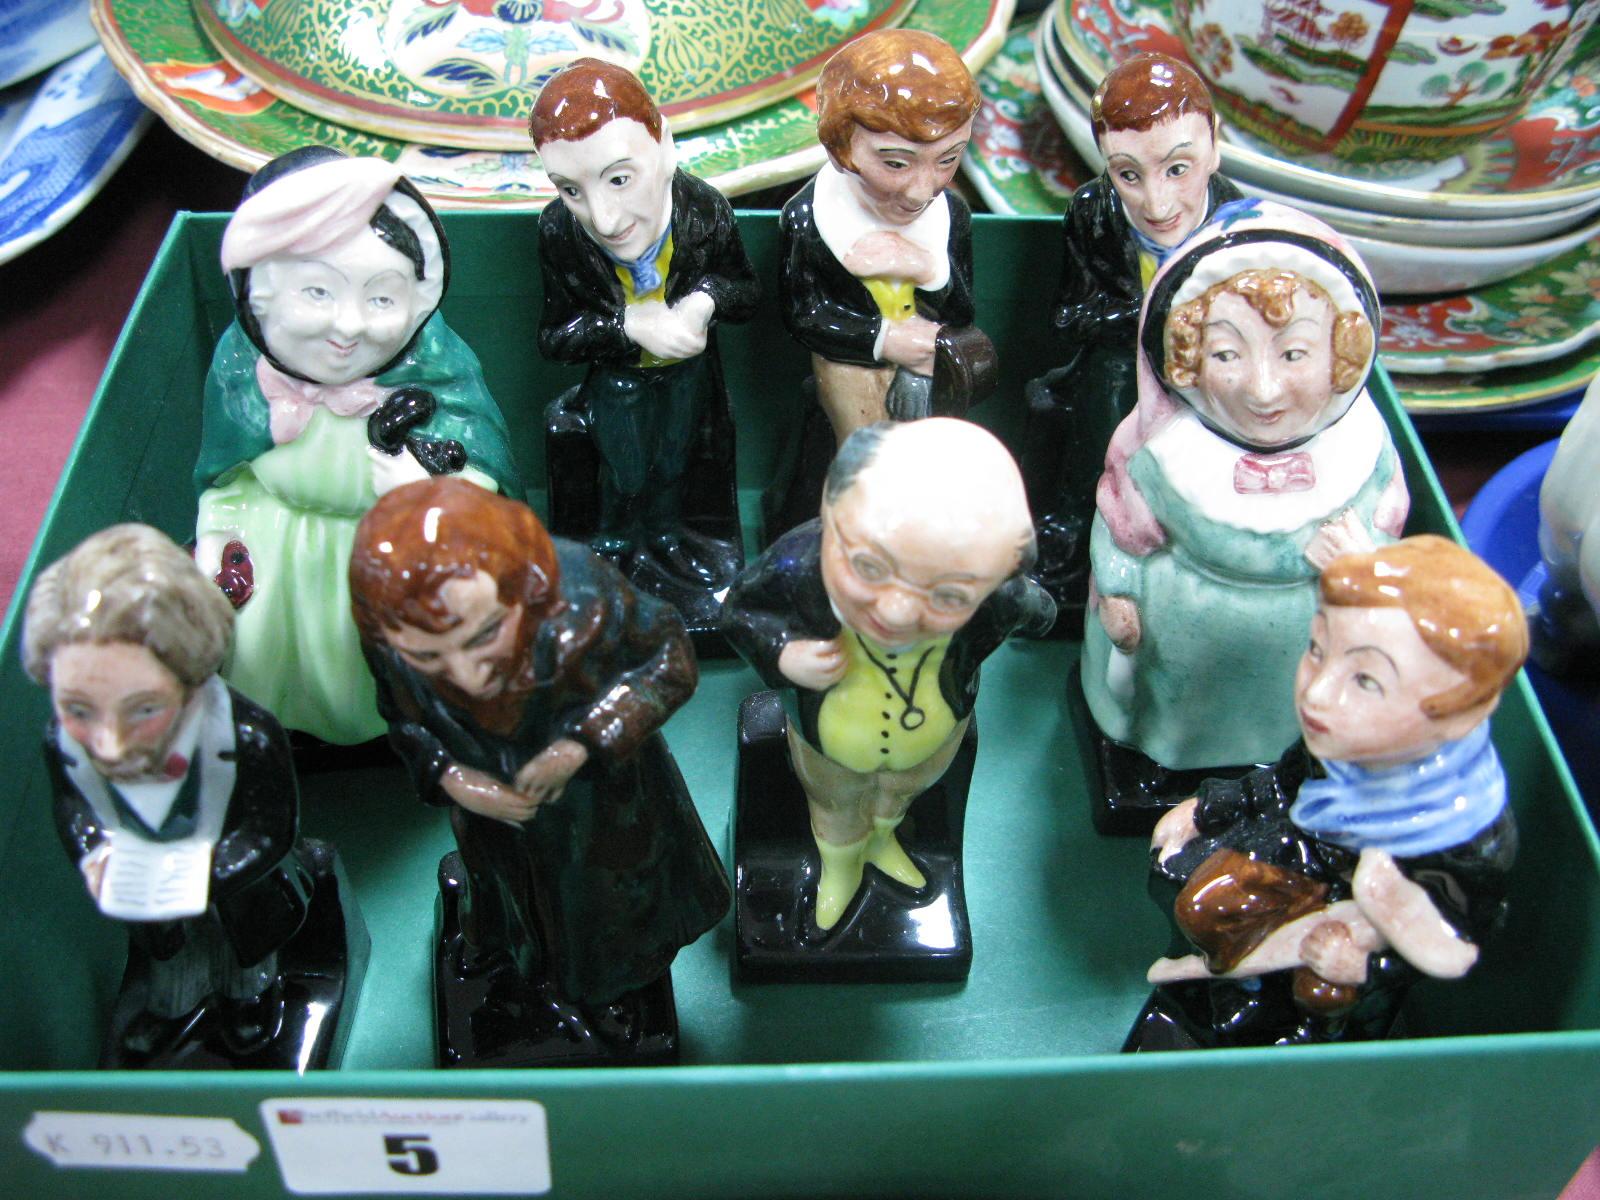 Lot 5 - Eight Royal Doulton Dickens Characters: Sairey Gamp, Fagin, Pickwick, Uriah Heep (2), David